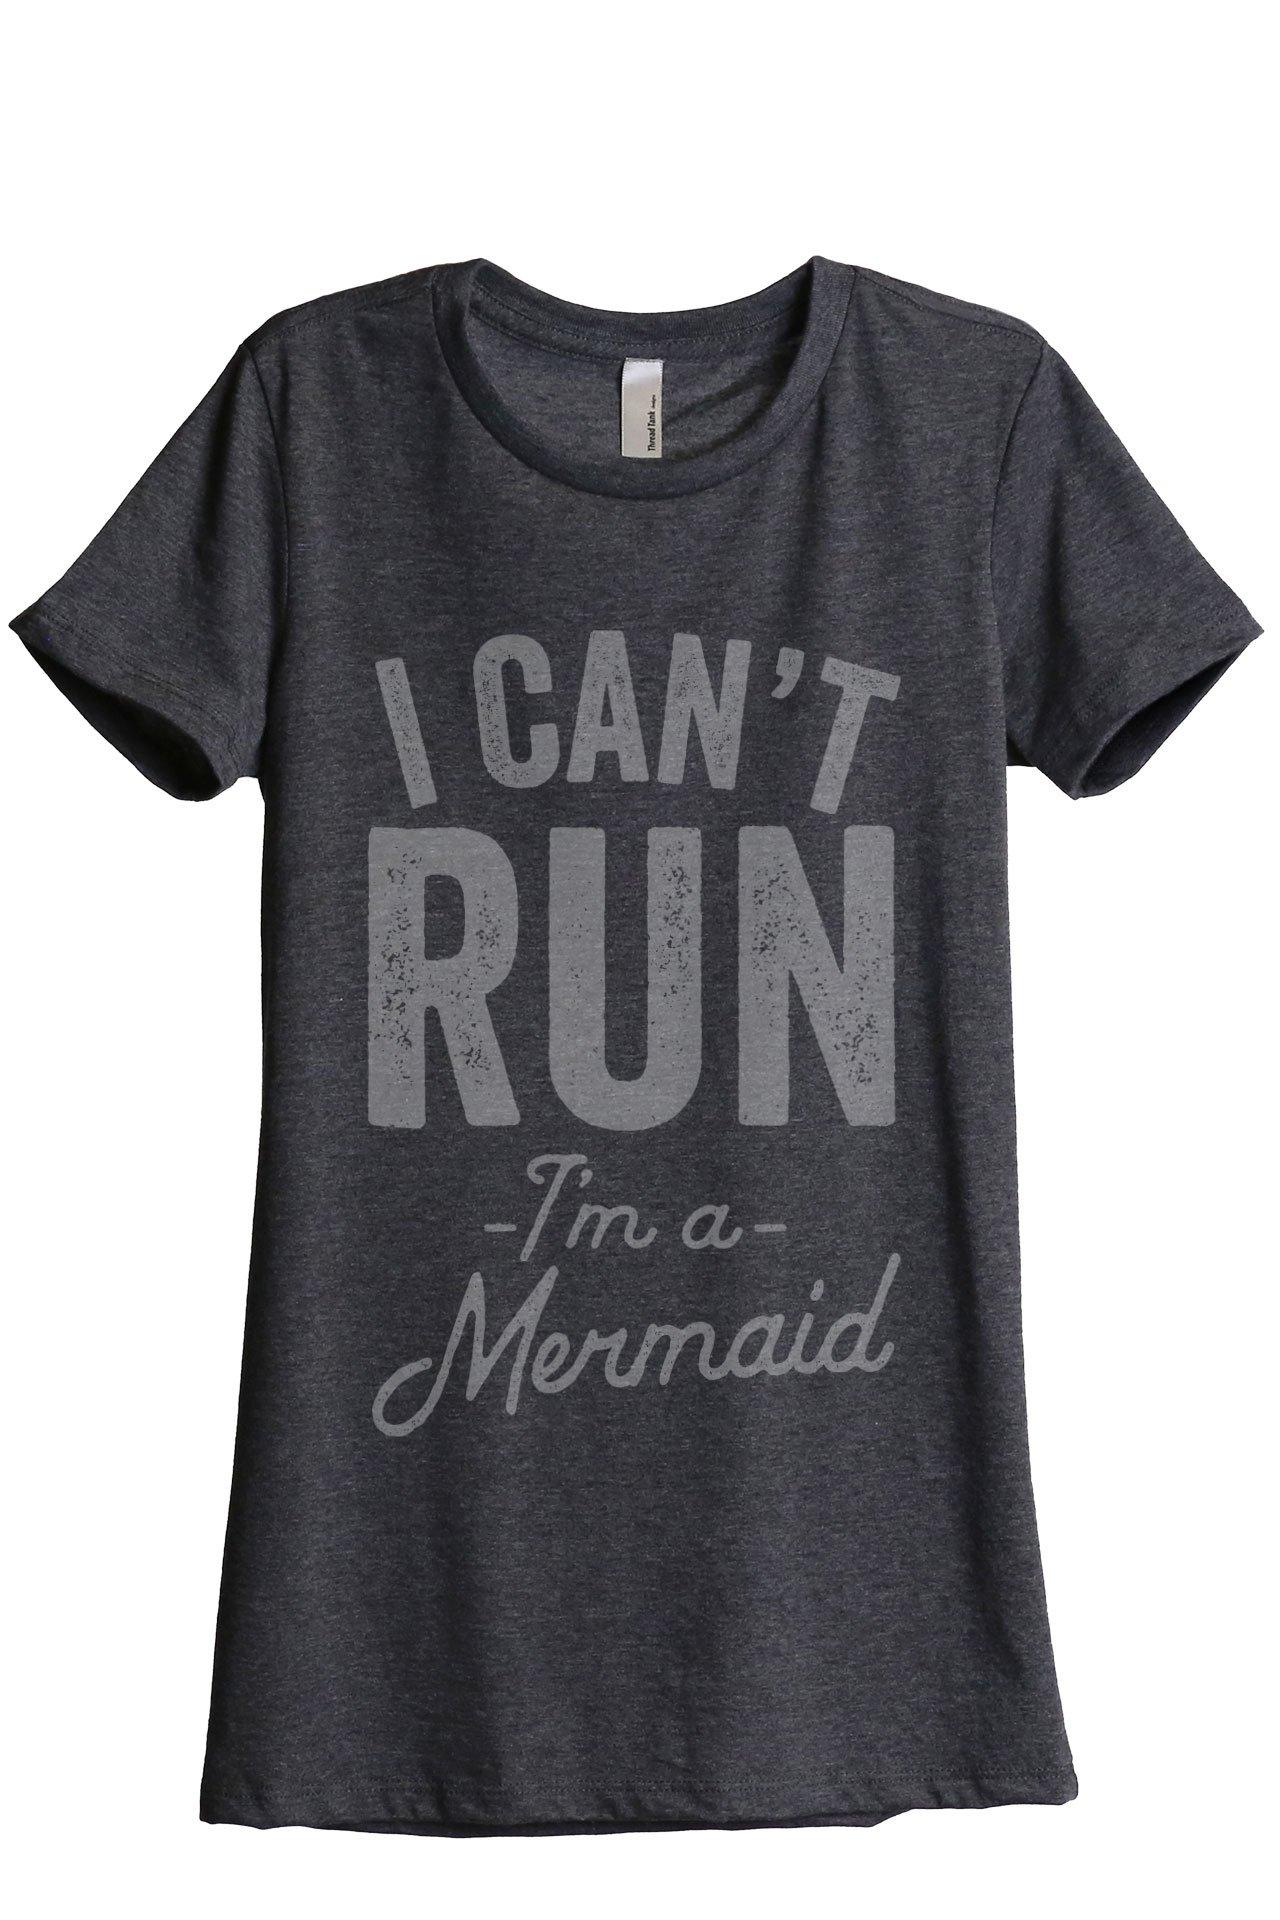 I Can't Run I'm A Mermaid Women's Fashion Relaxed T-Shirt Tee Charcoal Grey